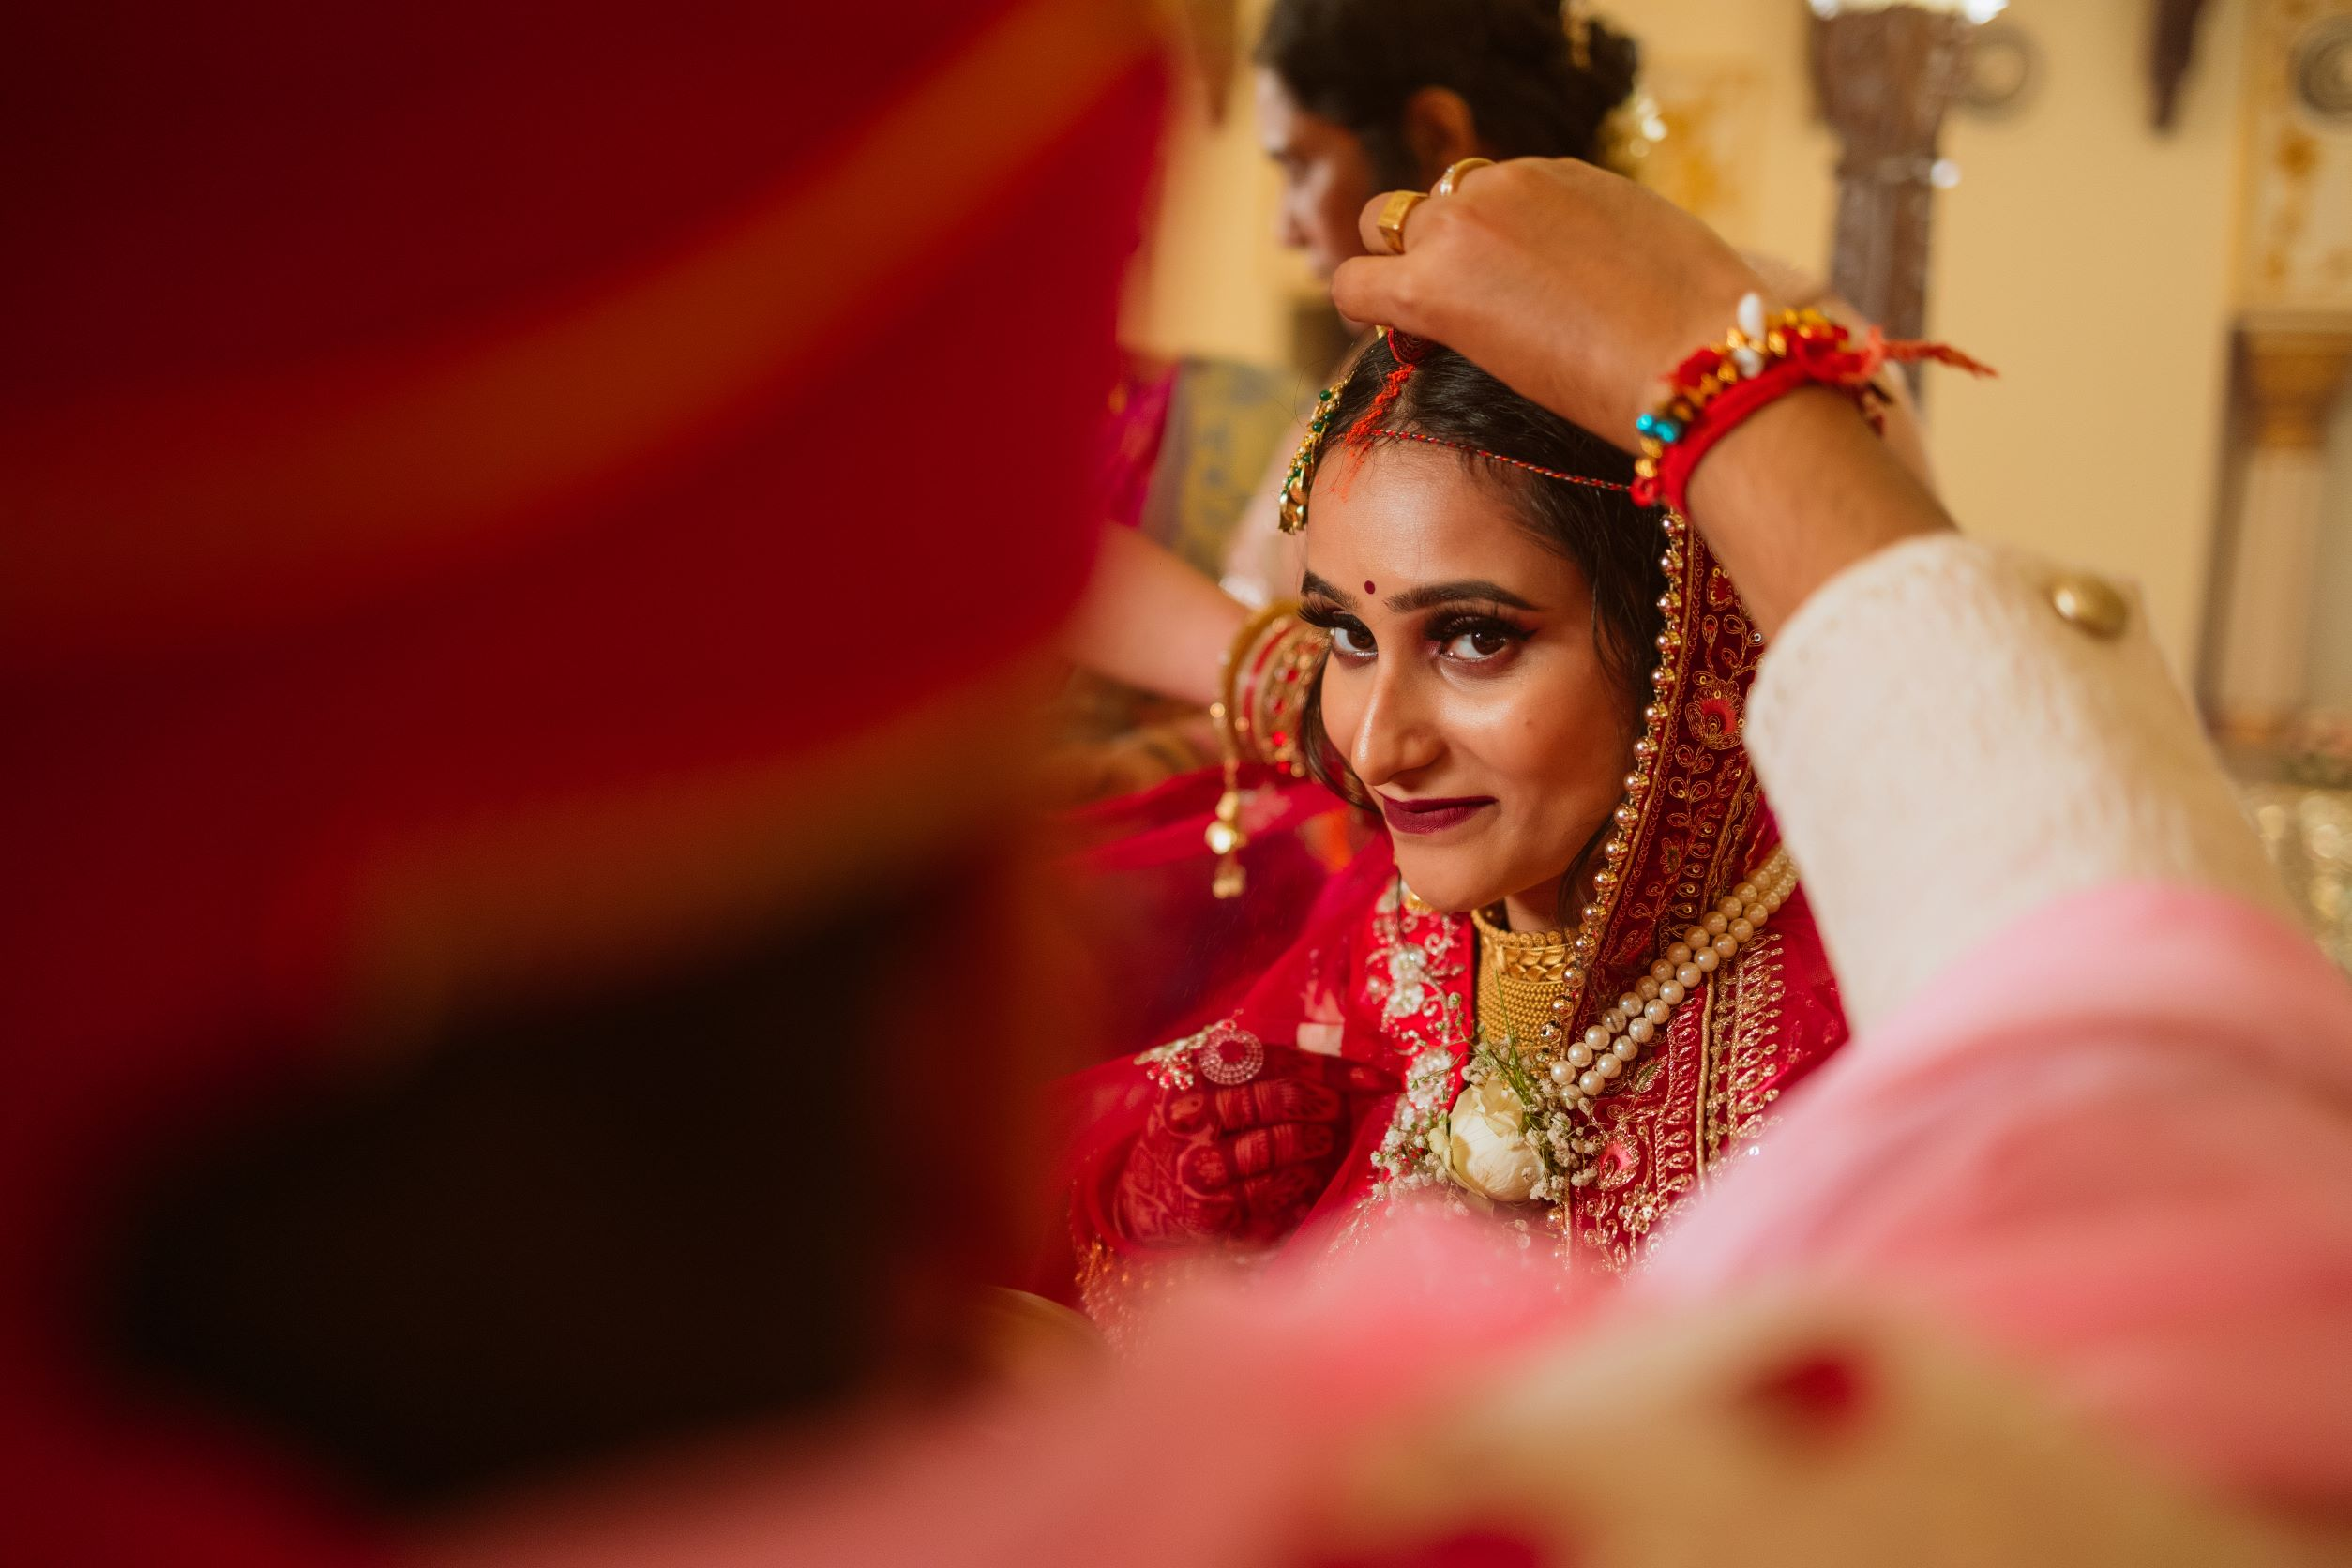 candid shot of the bride at her sindoor ceremony